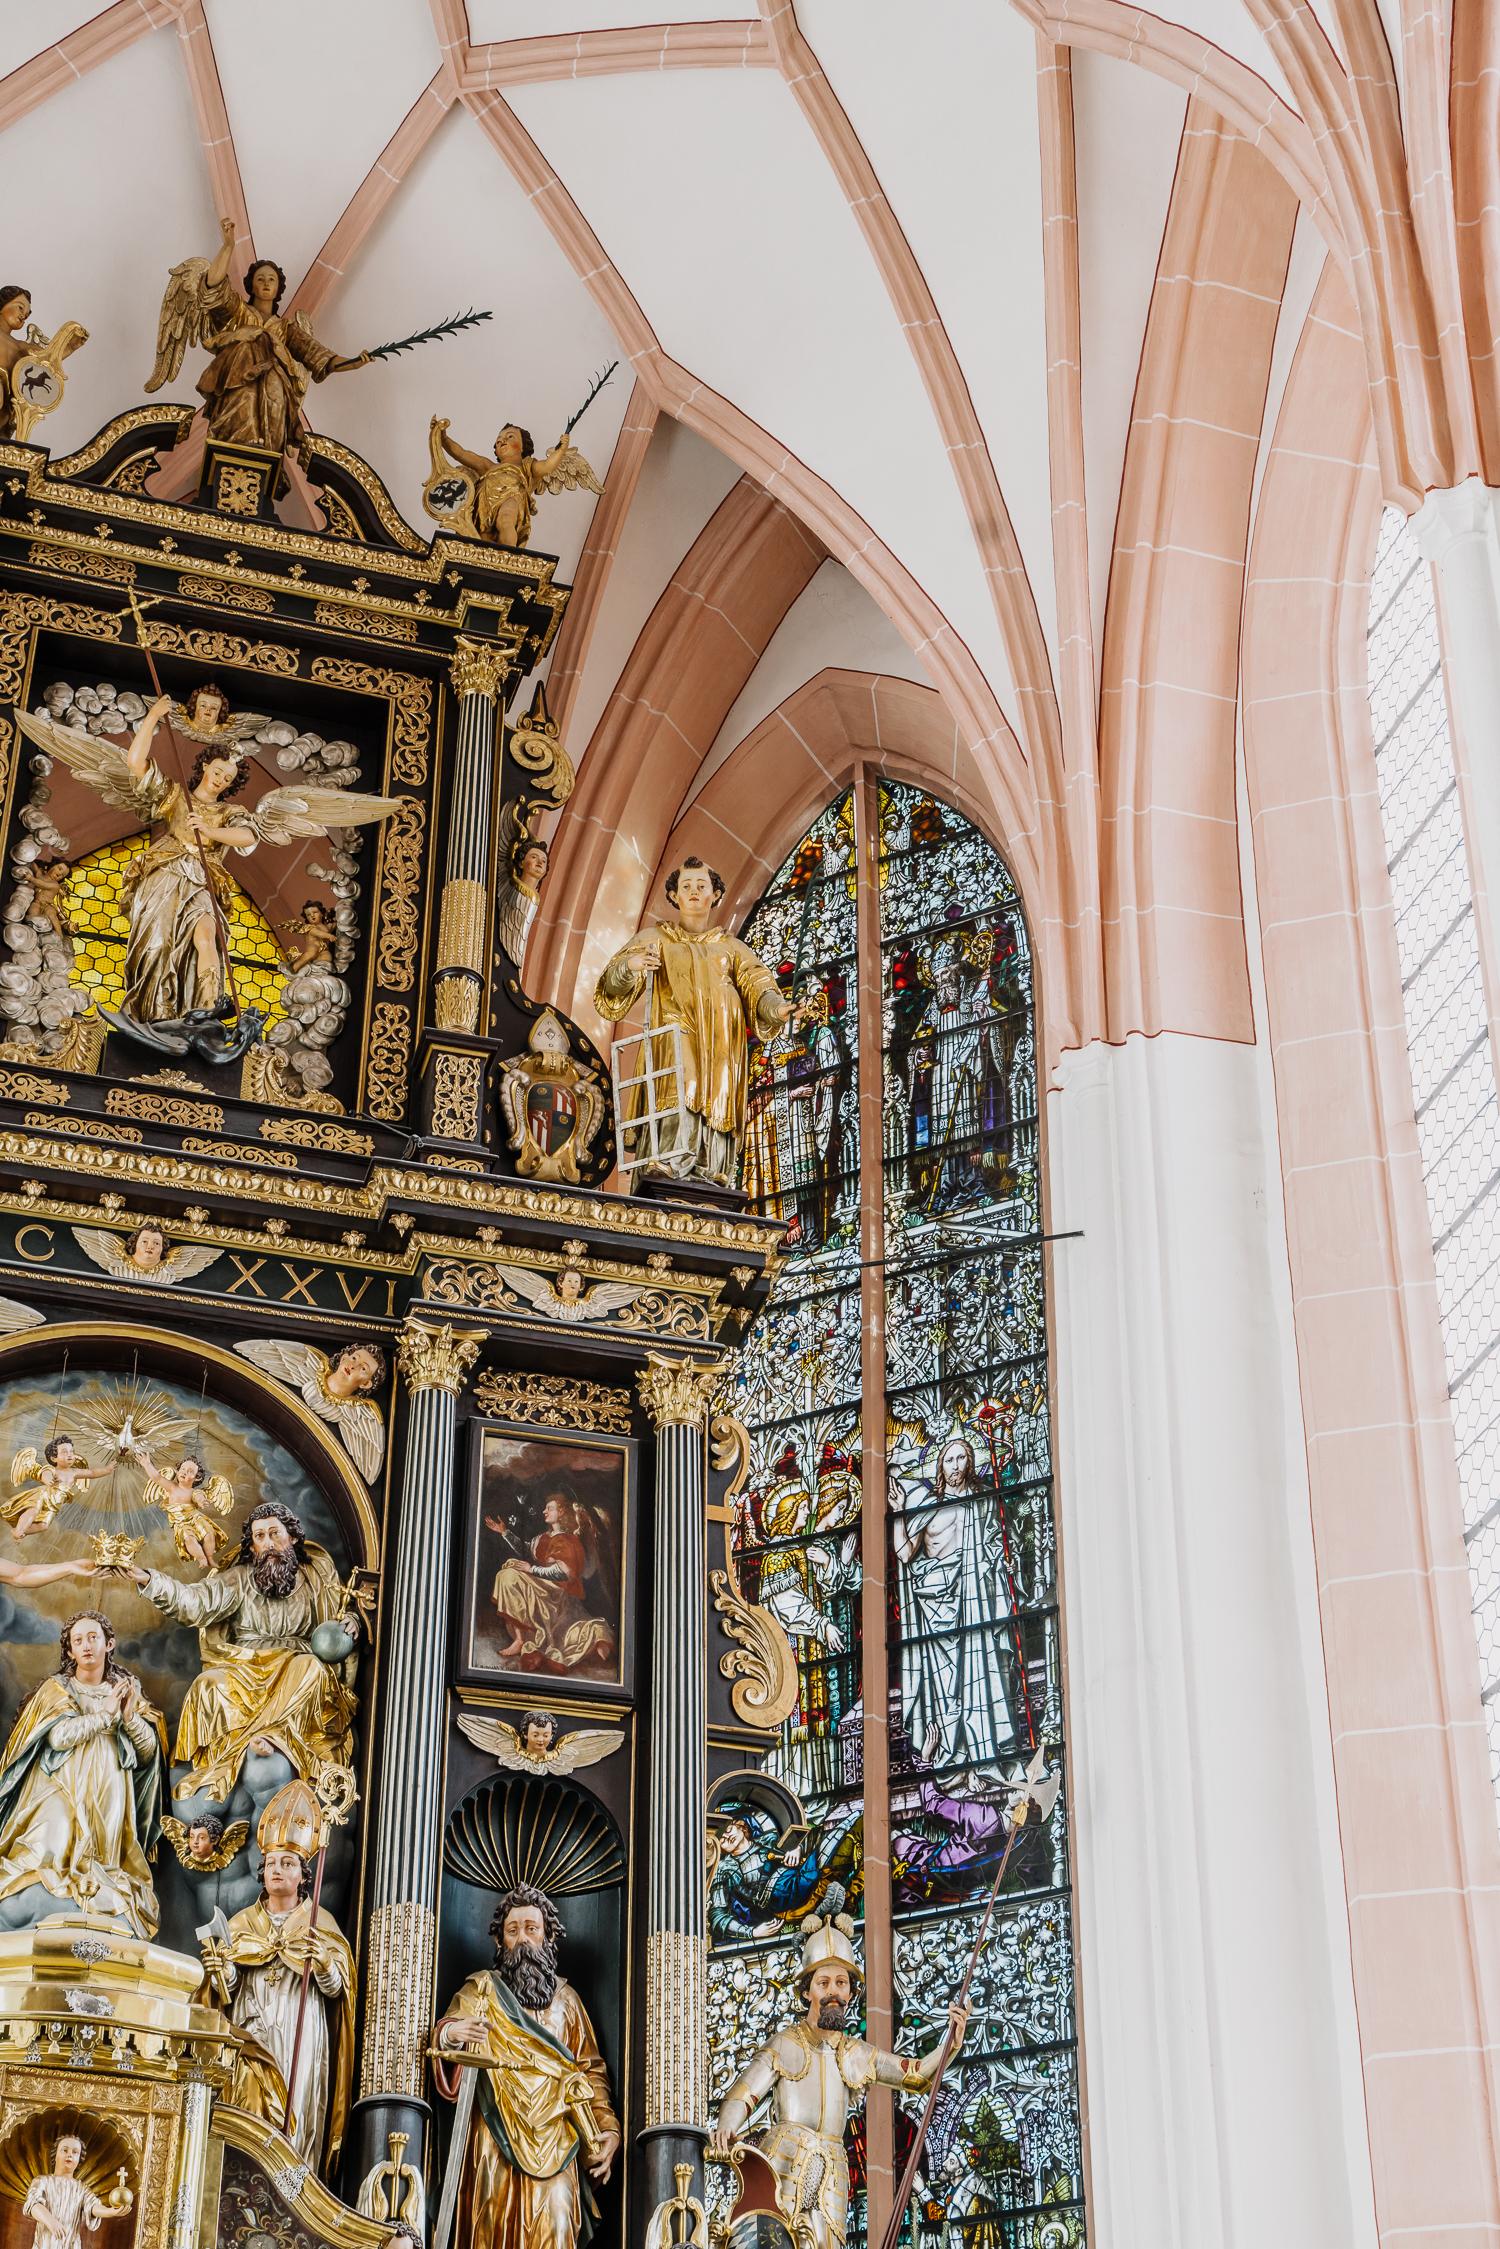 salzburg, austria, salzburg travel diary, sound of music tour, mondsee wedding chapel